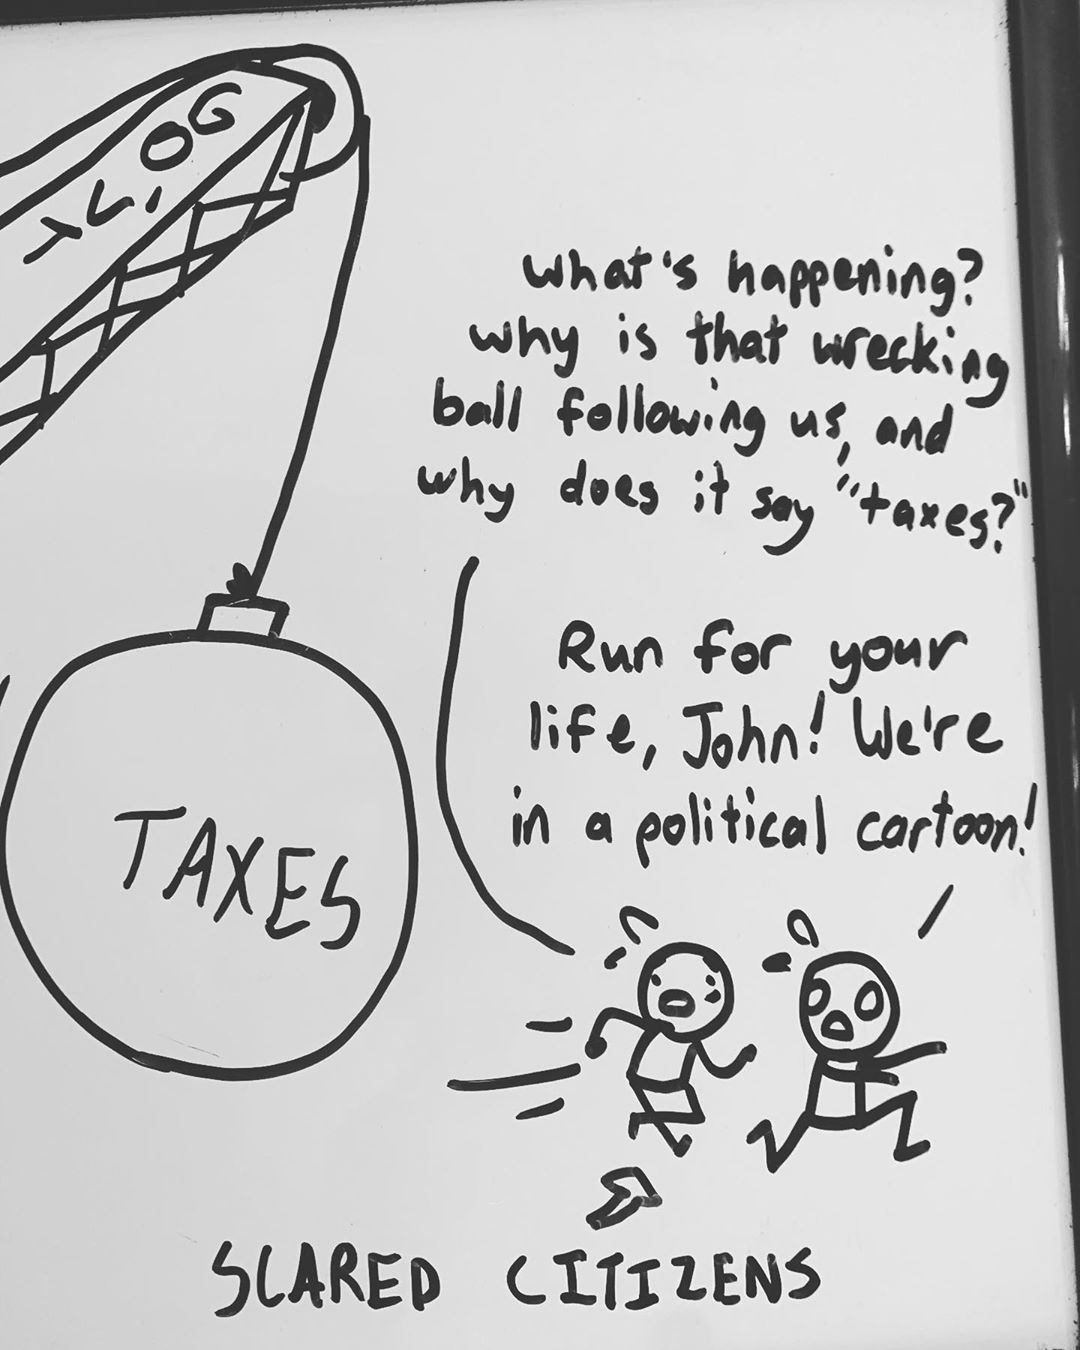 A comic from my 14yo son's whiteboard